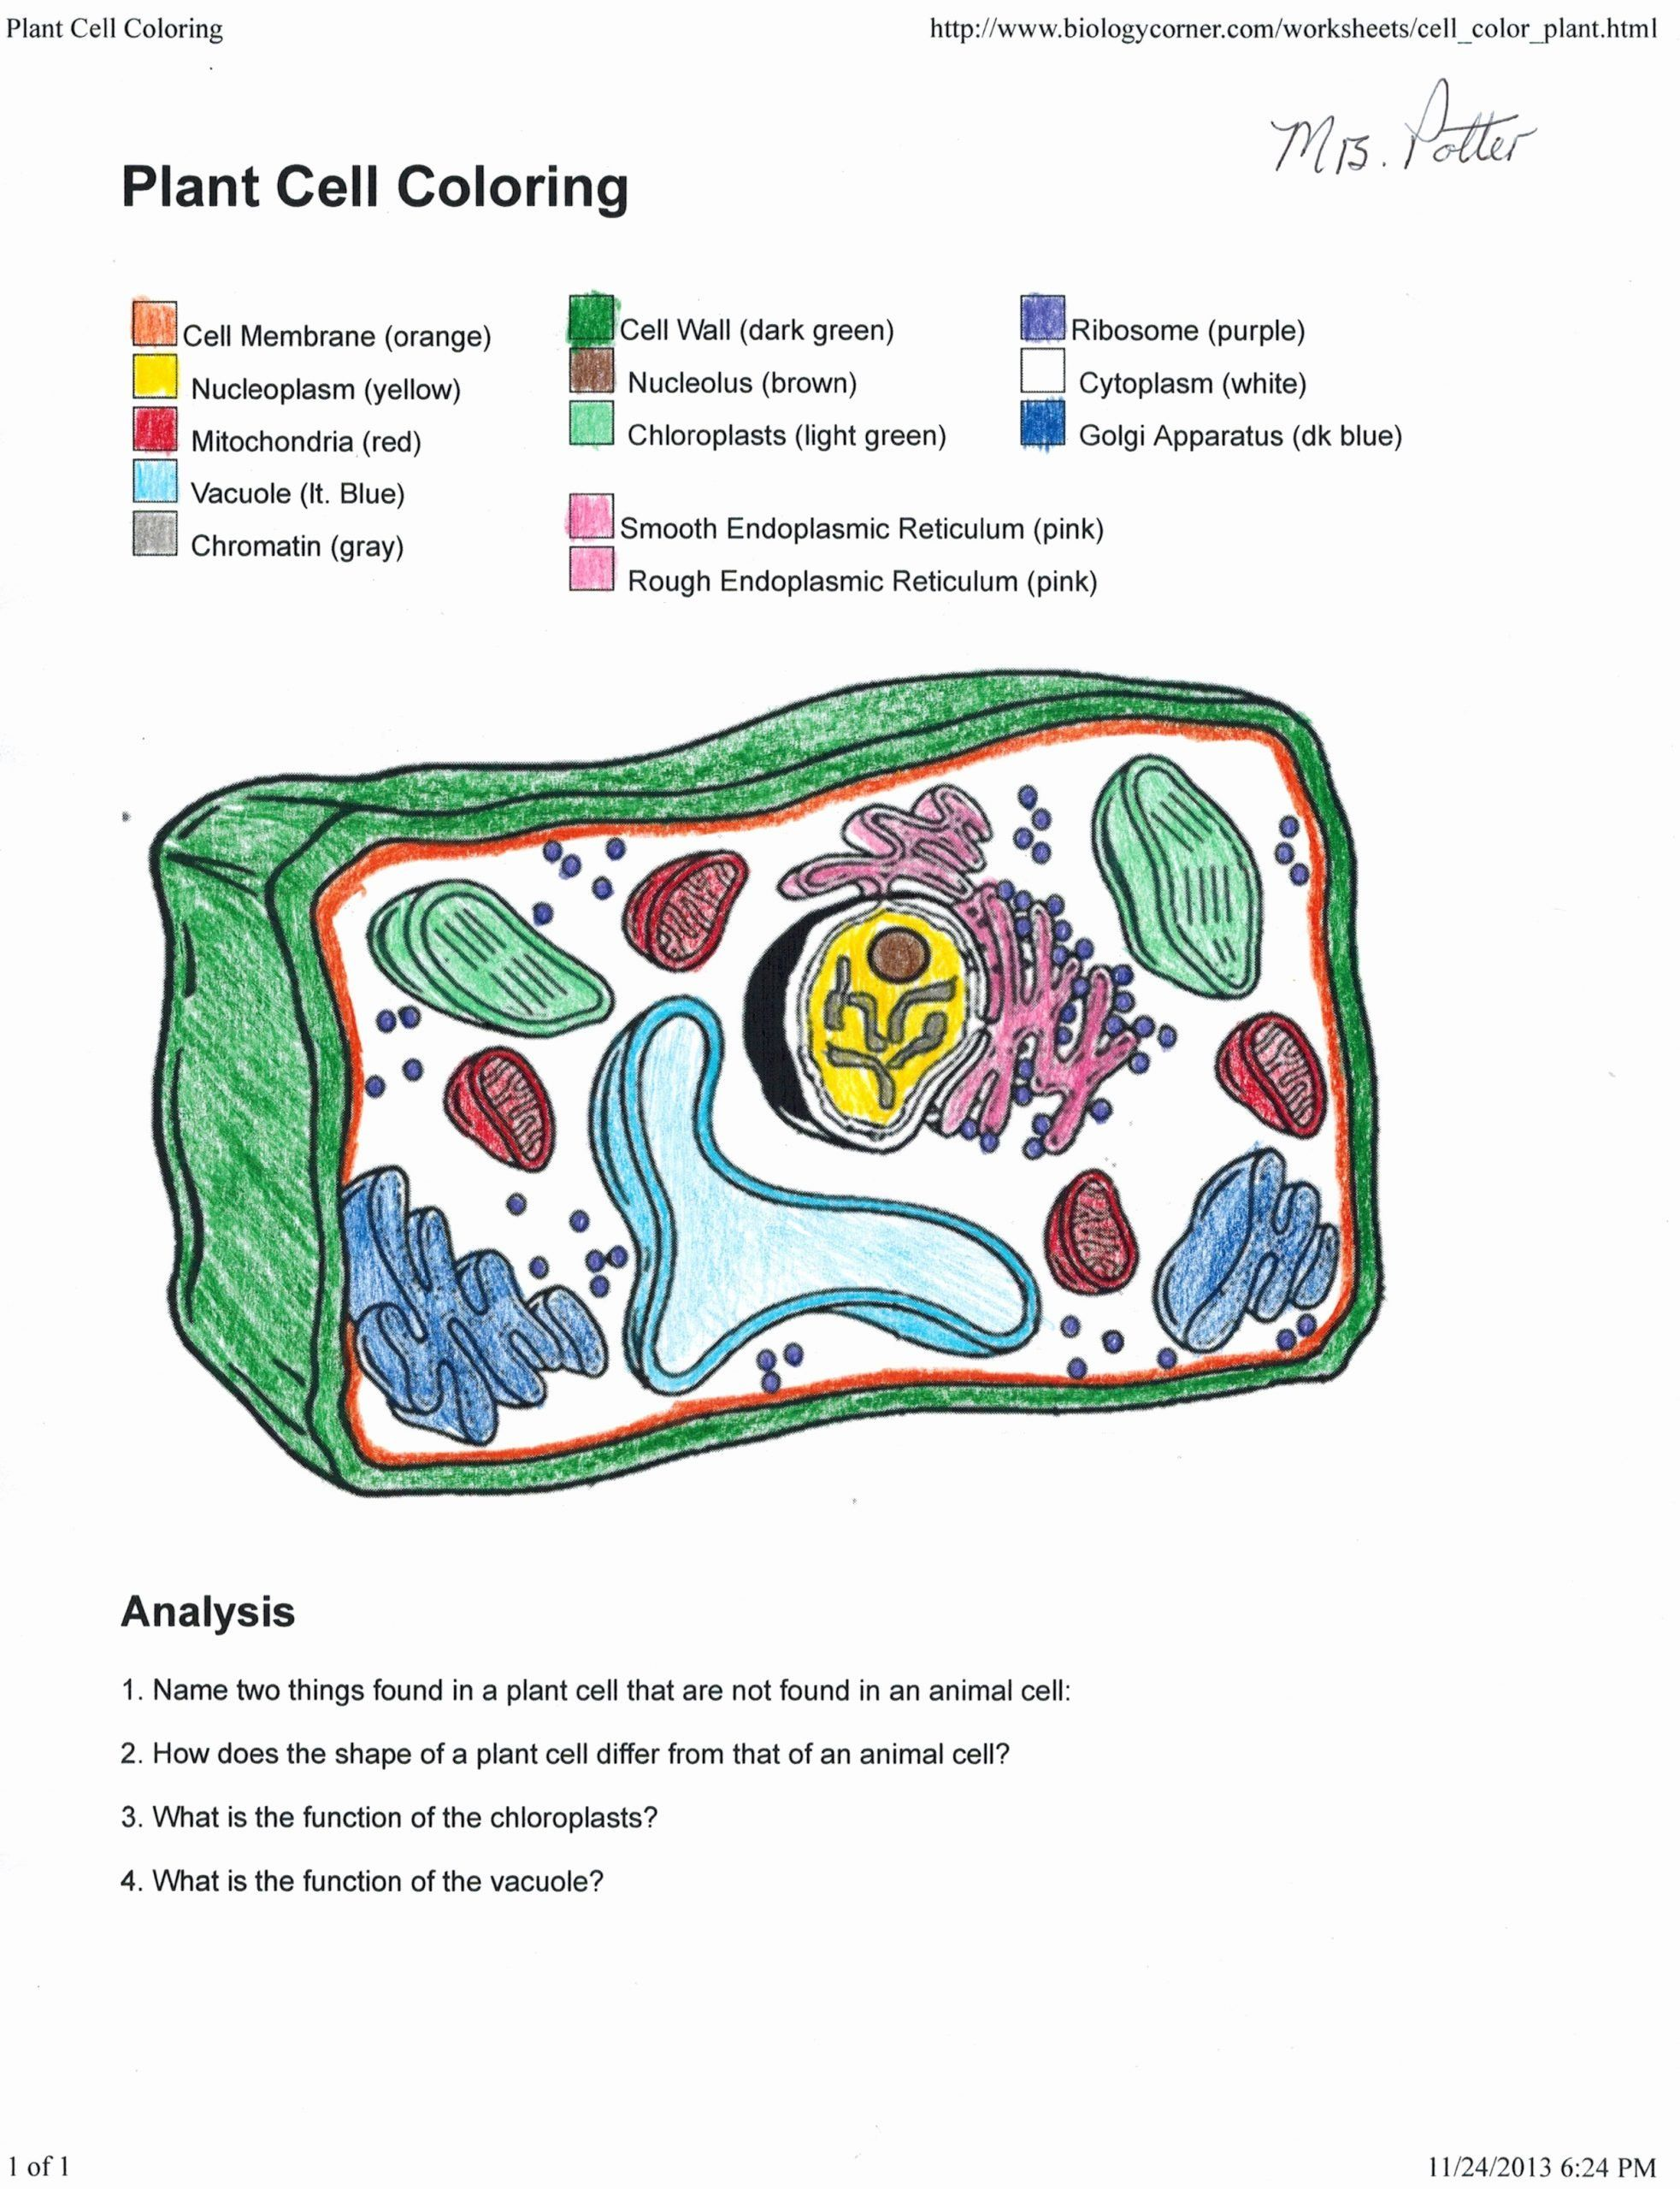 Animal Cell Coloring Worksheet Elegant Plant Cell Coloring Key 0 Plant Cell Coloring Key With Plant Cells Worksheet Animal Cells Worksheet Cells Worksheet